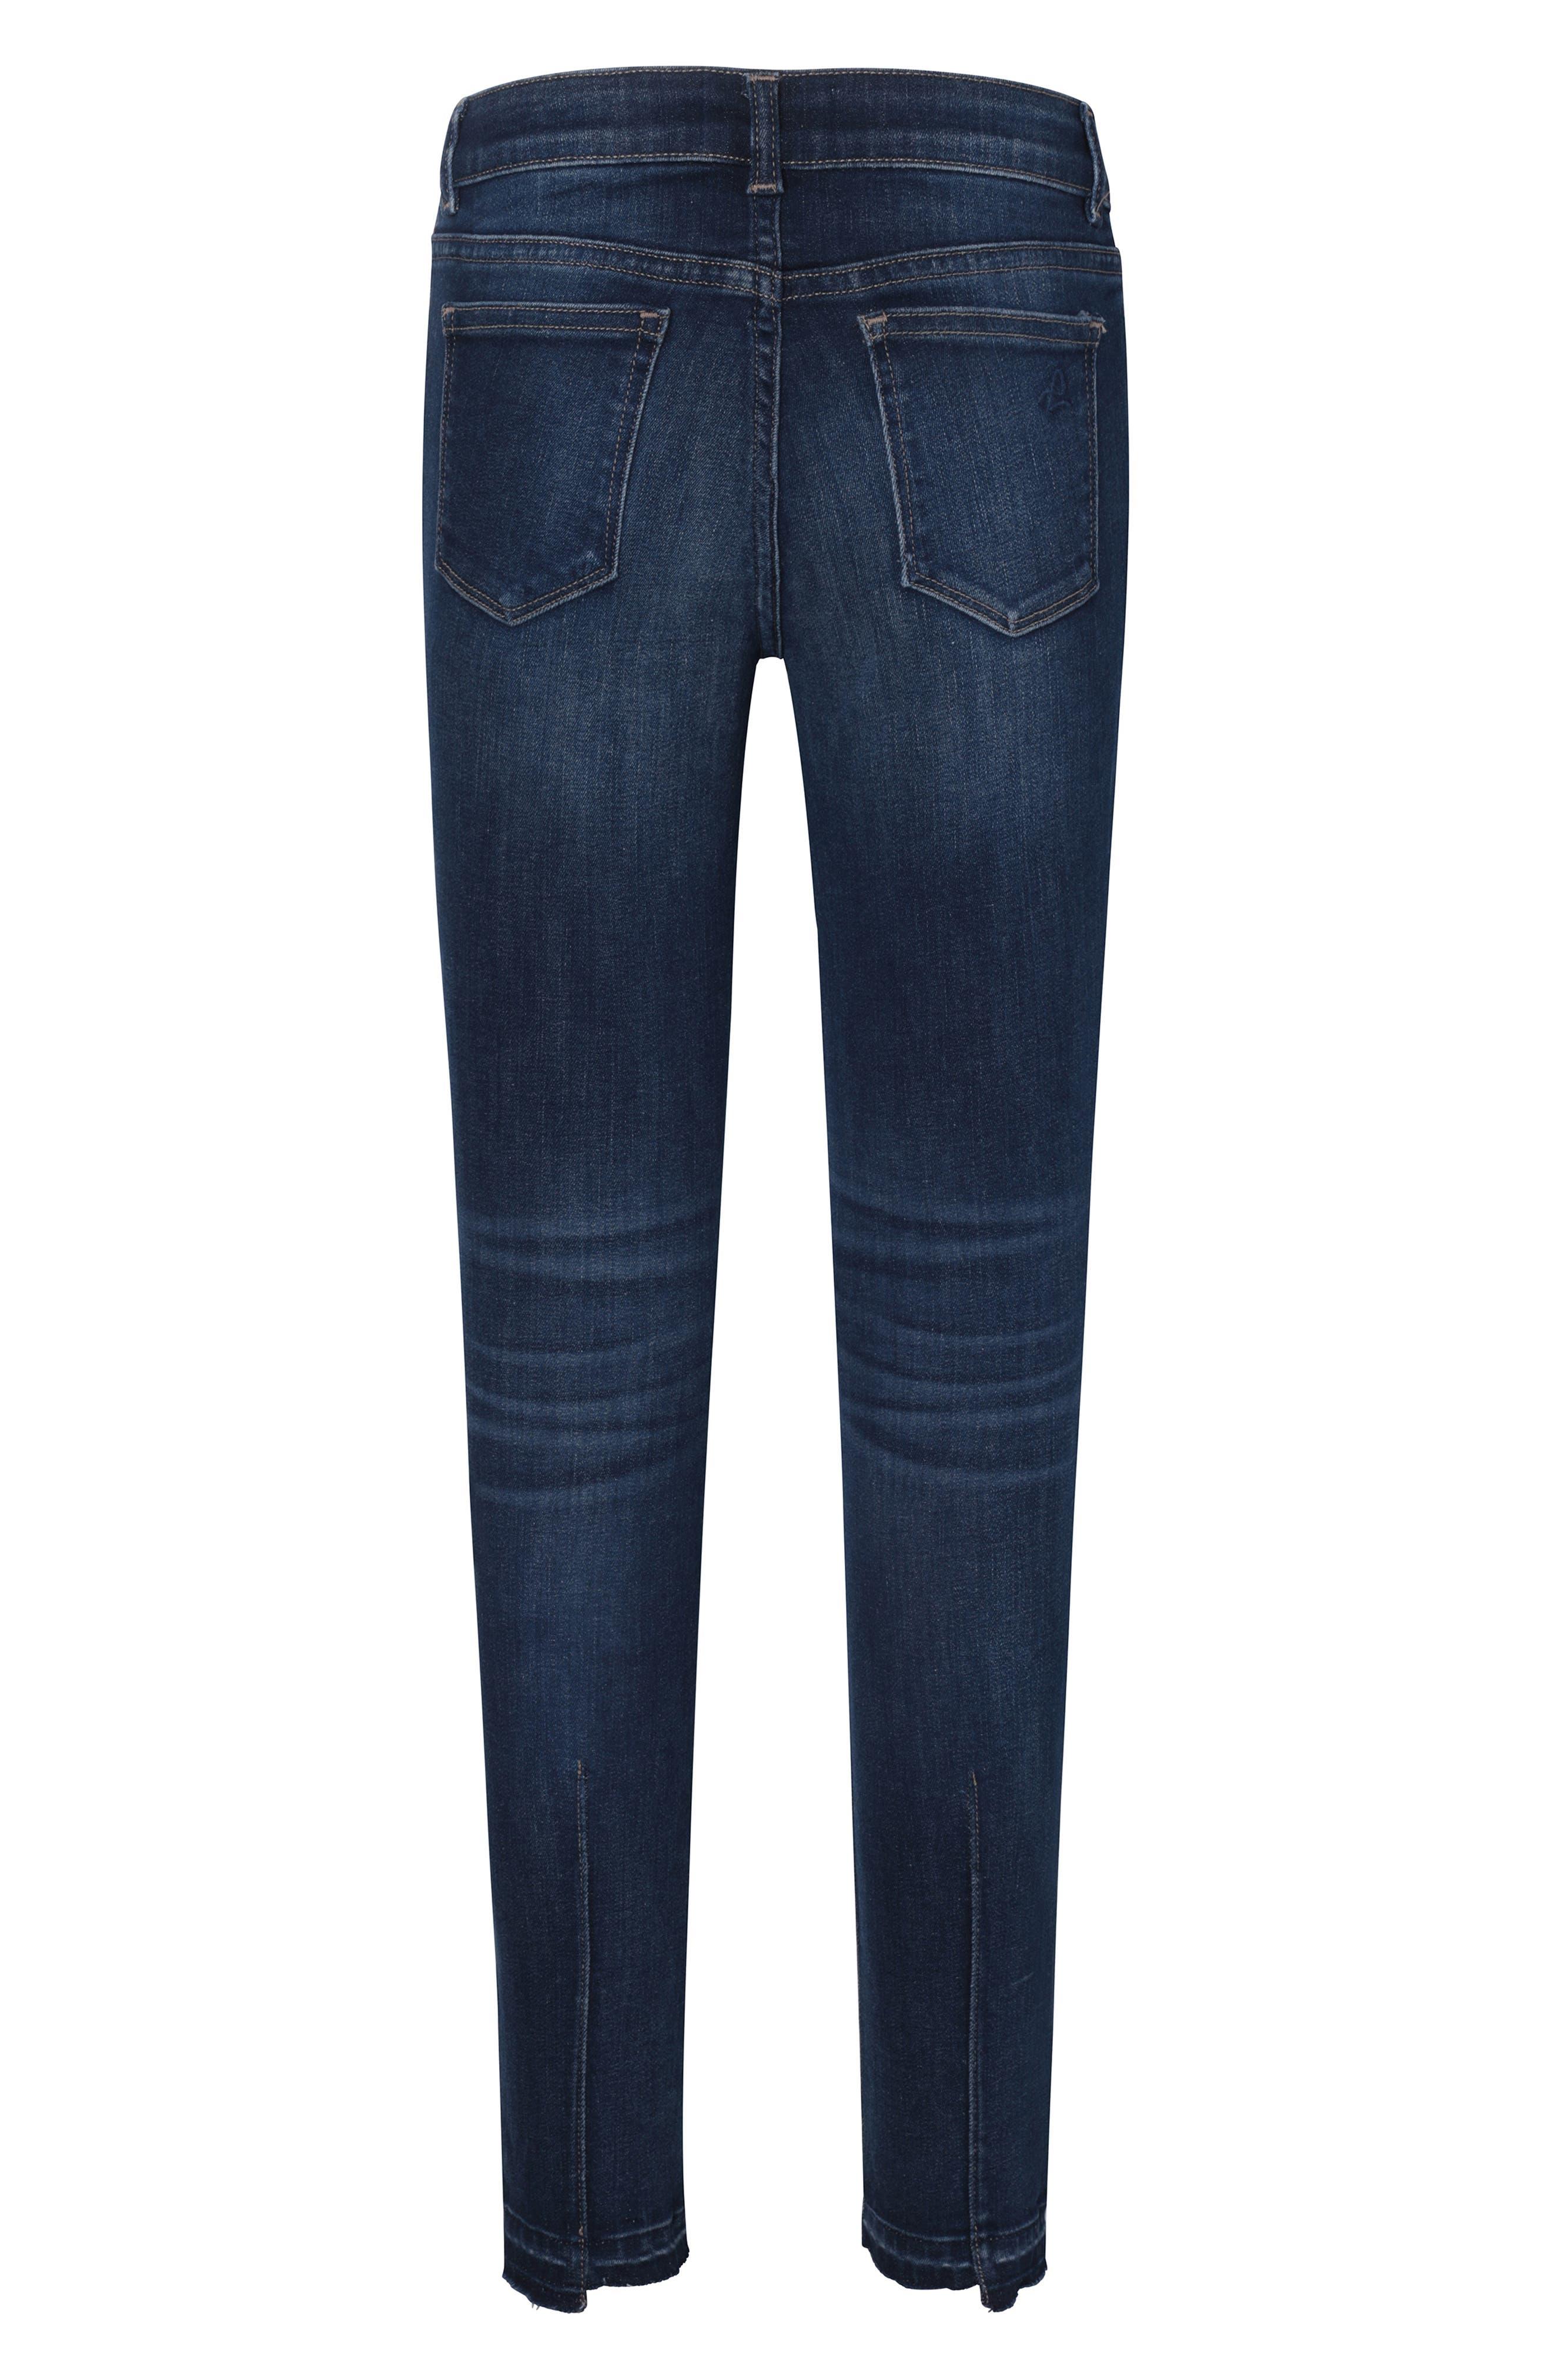 Chloe Step Hem Stretch Denim Skinny Jeans,                             Alternate thumbnail 2, color,                             LIMELIGHT